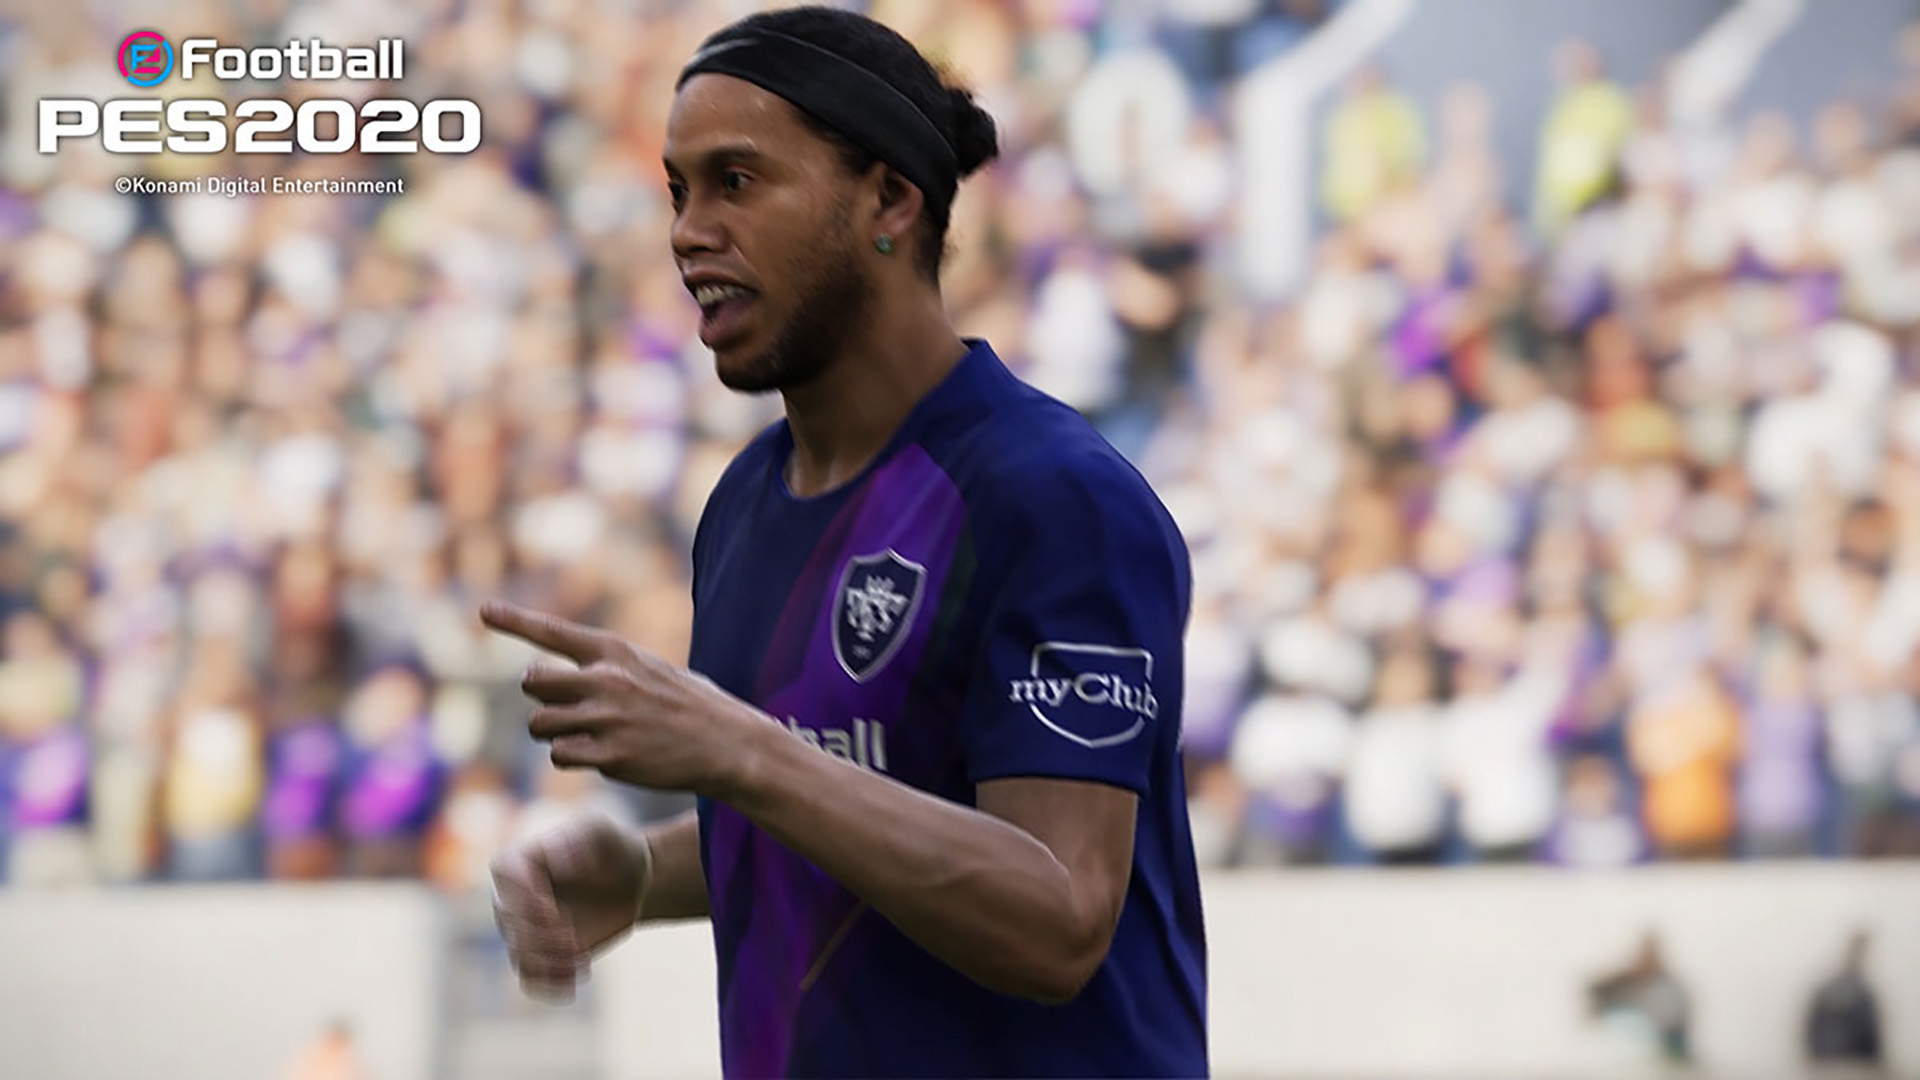 PES 2020 Pro Evolution Soccer 2020 Ronaldinho